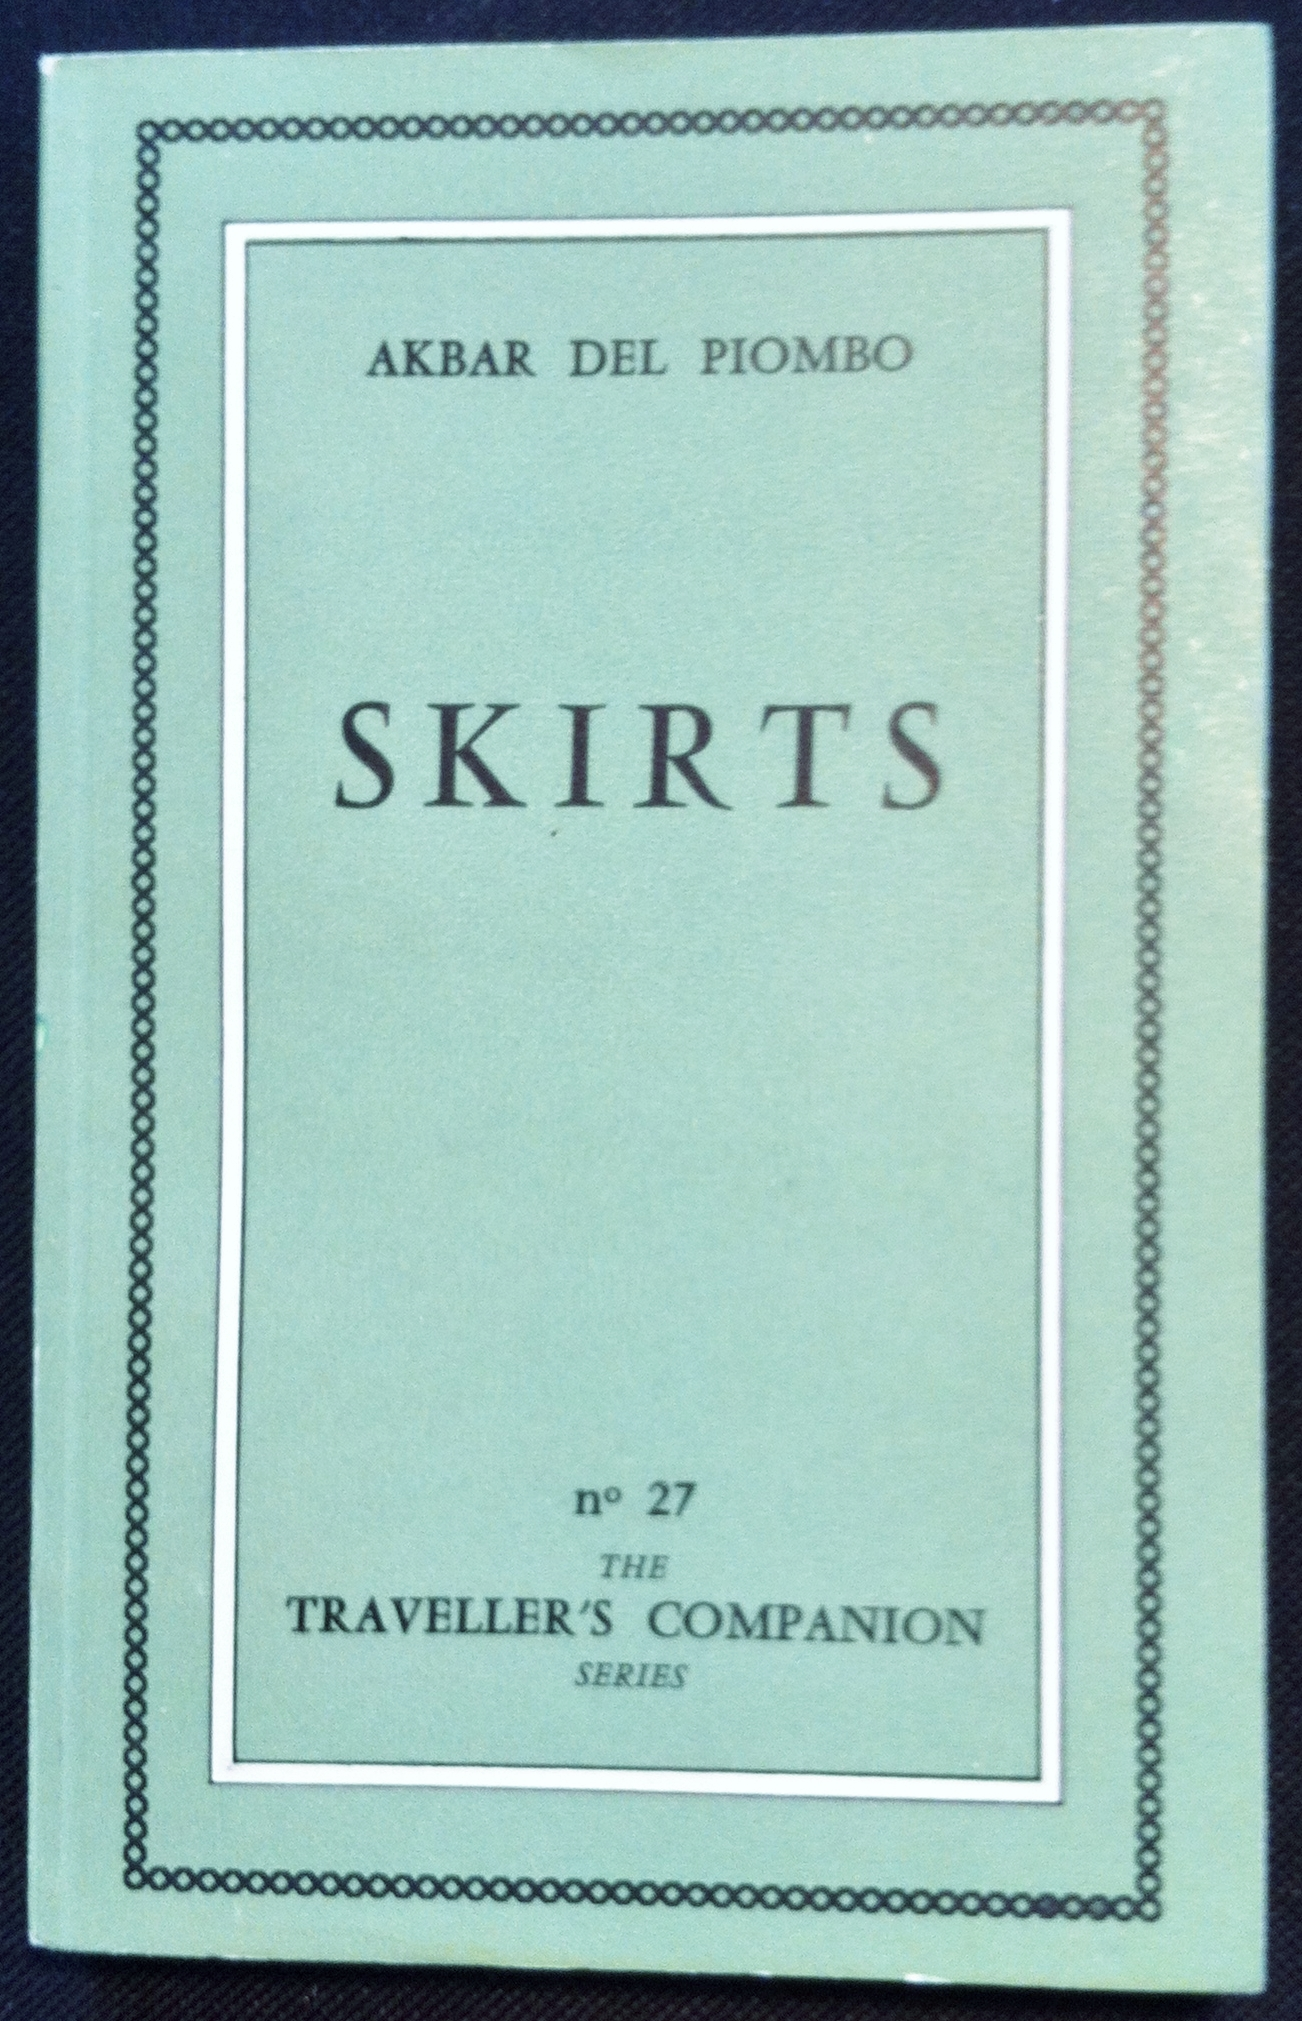 Catalog for travellers companion erotica